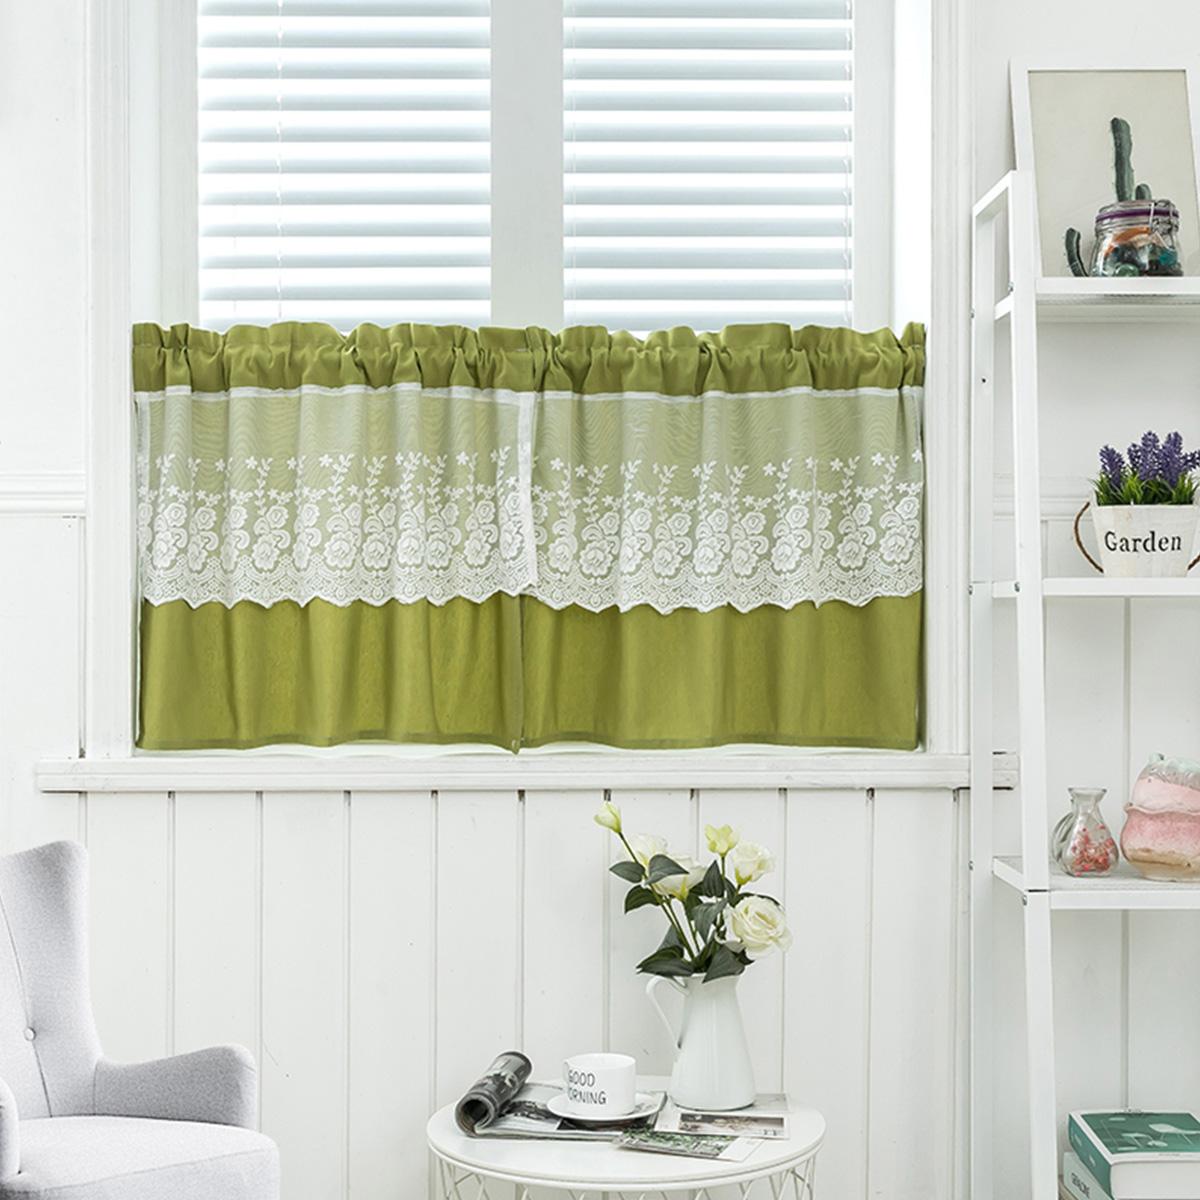 Details About 4 Colors Lace Kitchen Tiers Cabinet Curtain Window Short Curtains Half Treatment